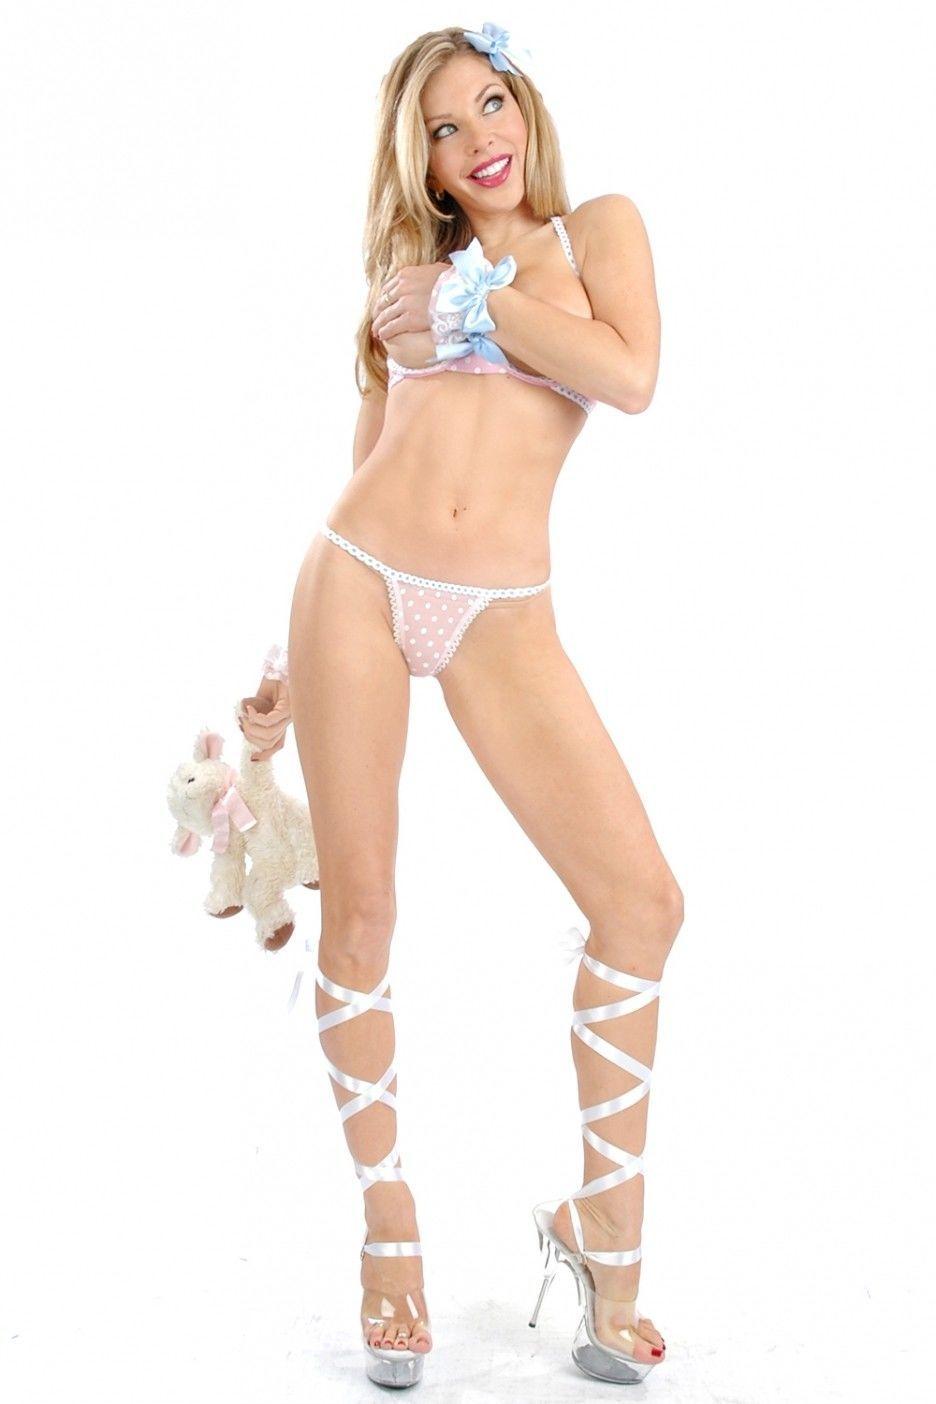 Jennifer lyons nude scene